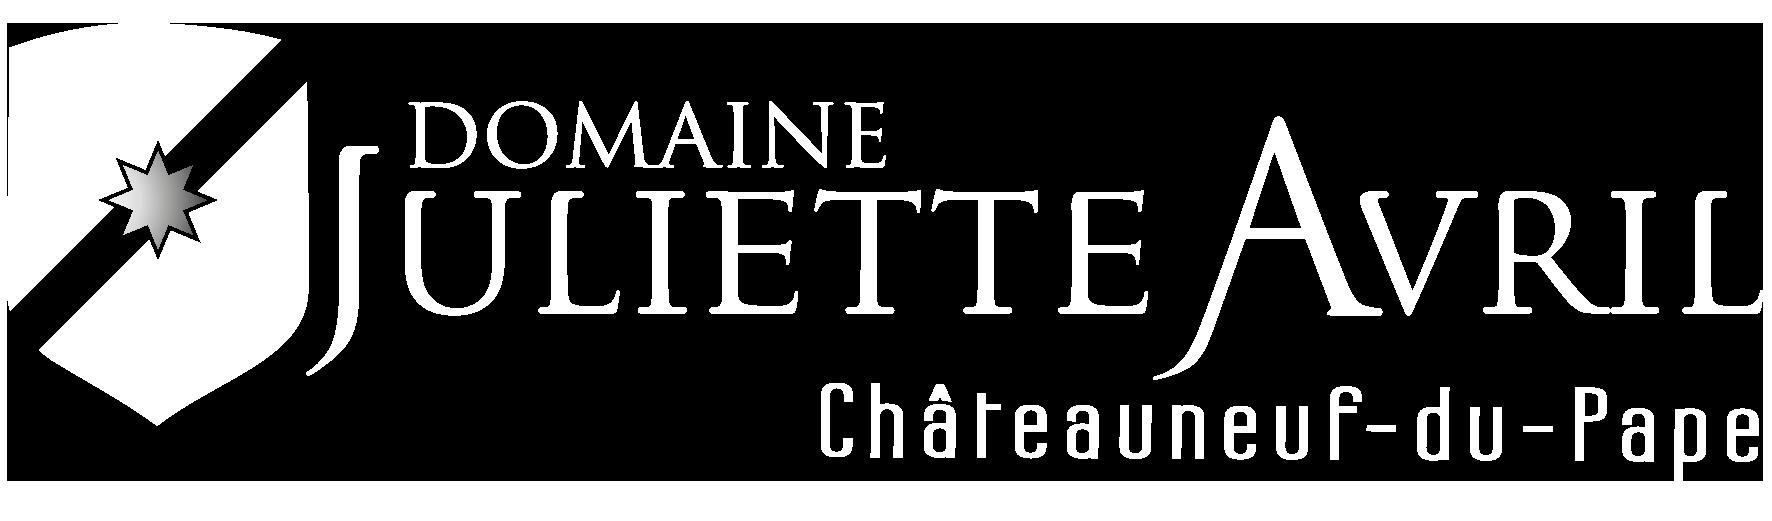 Domaine Juliette Avril